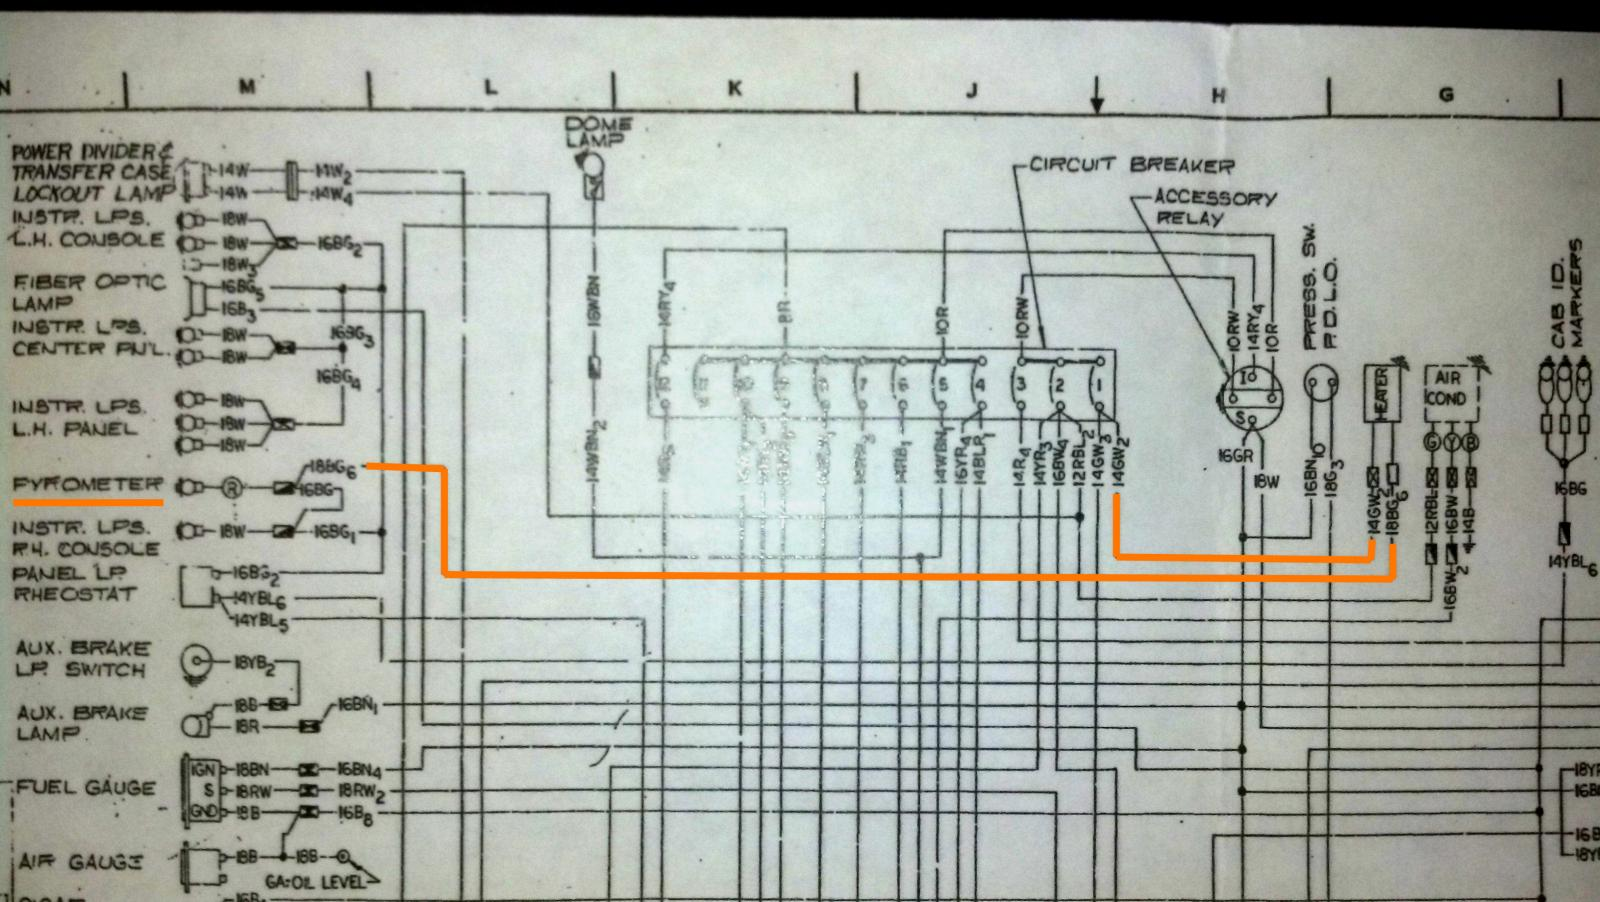 1995 Mack Truck Wire Diagrams | Wiring Liry Mack R Model Wiring Diagram on mack hvac diagram, mack suspension, mack fuse diagram, mack steering diagram, mack transmission diagram, mack relay diagram, mack fuel system diagram, mack motor diagram, mack parts diagram, mack pump diagram, mack rear end diagram, mack engine diagram,